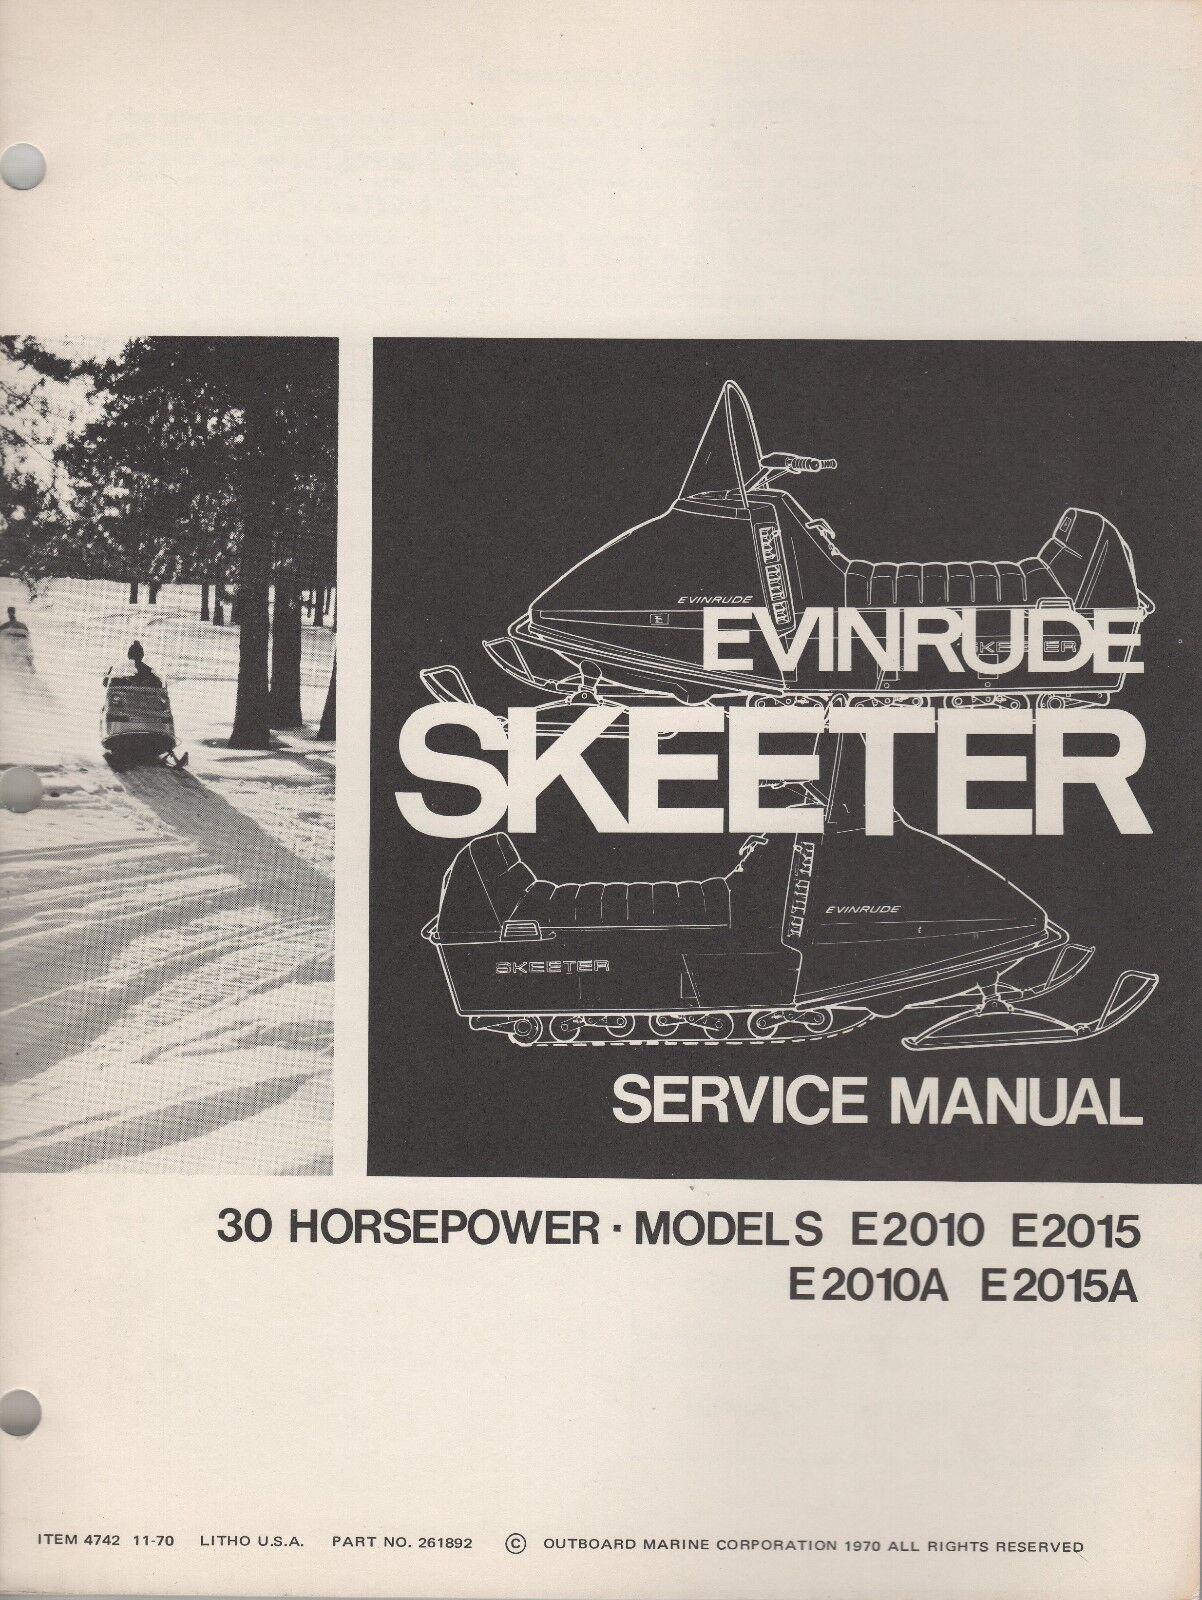 1971 EVINRUDE SKEETER 30 HP  SNOWMOBILE  SERVICE MANUAL P N 261892 (389)